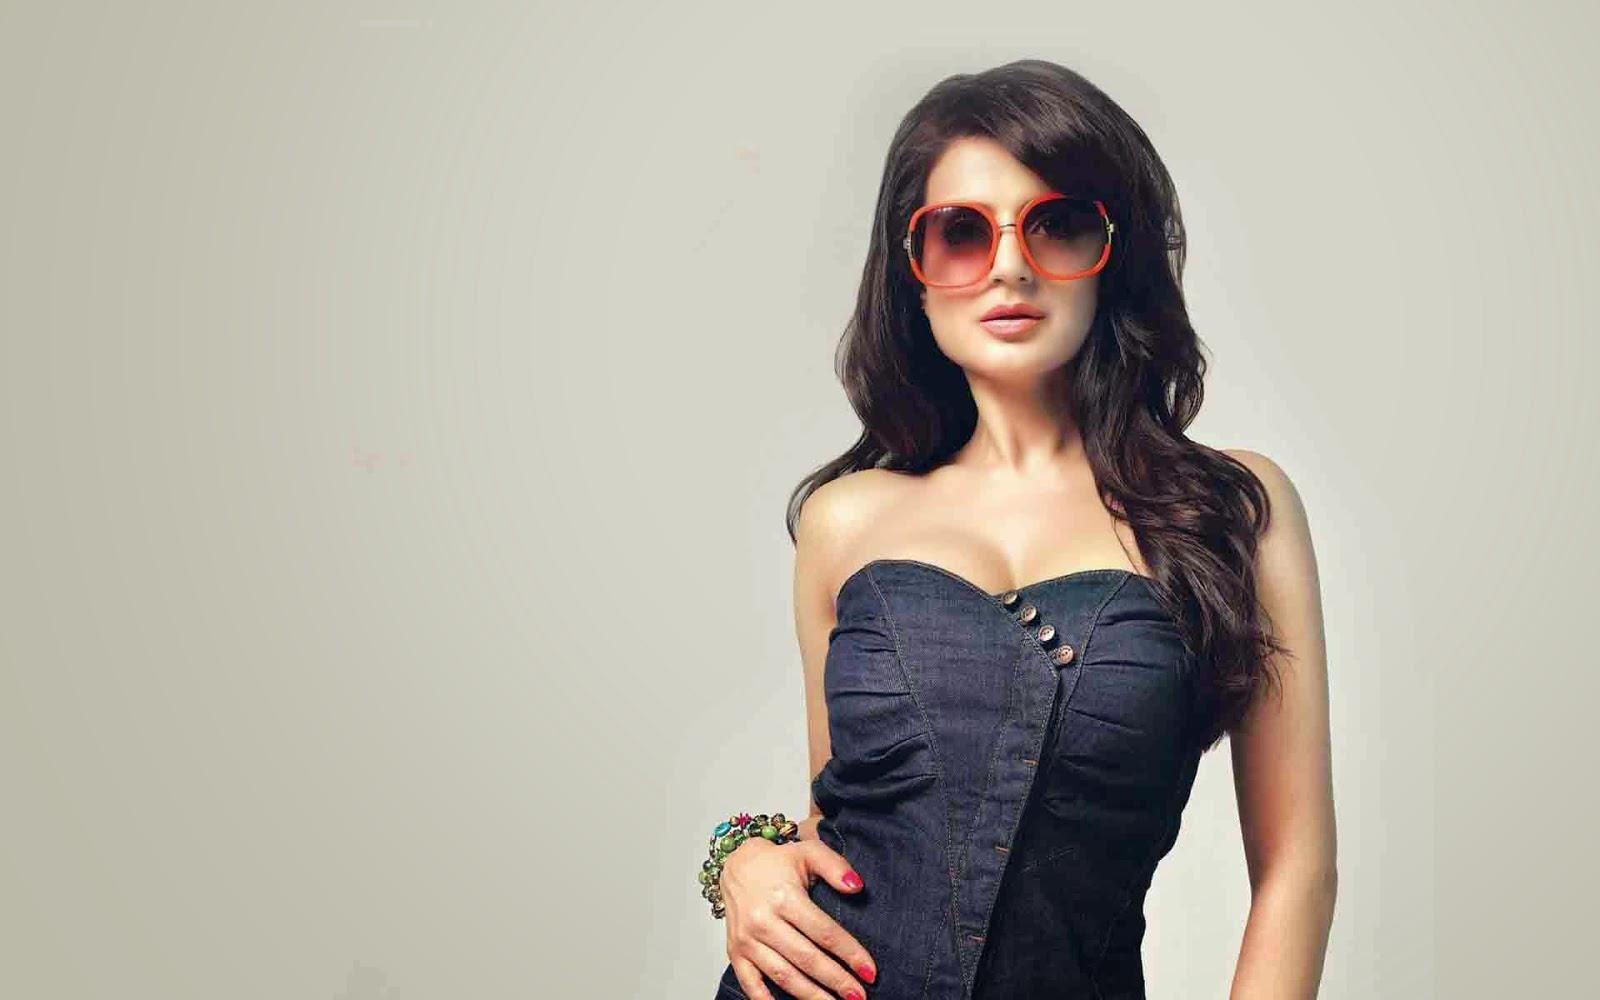 Ameesha Patel Wallpaper download - Actress HD Wallpaper